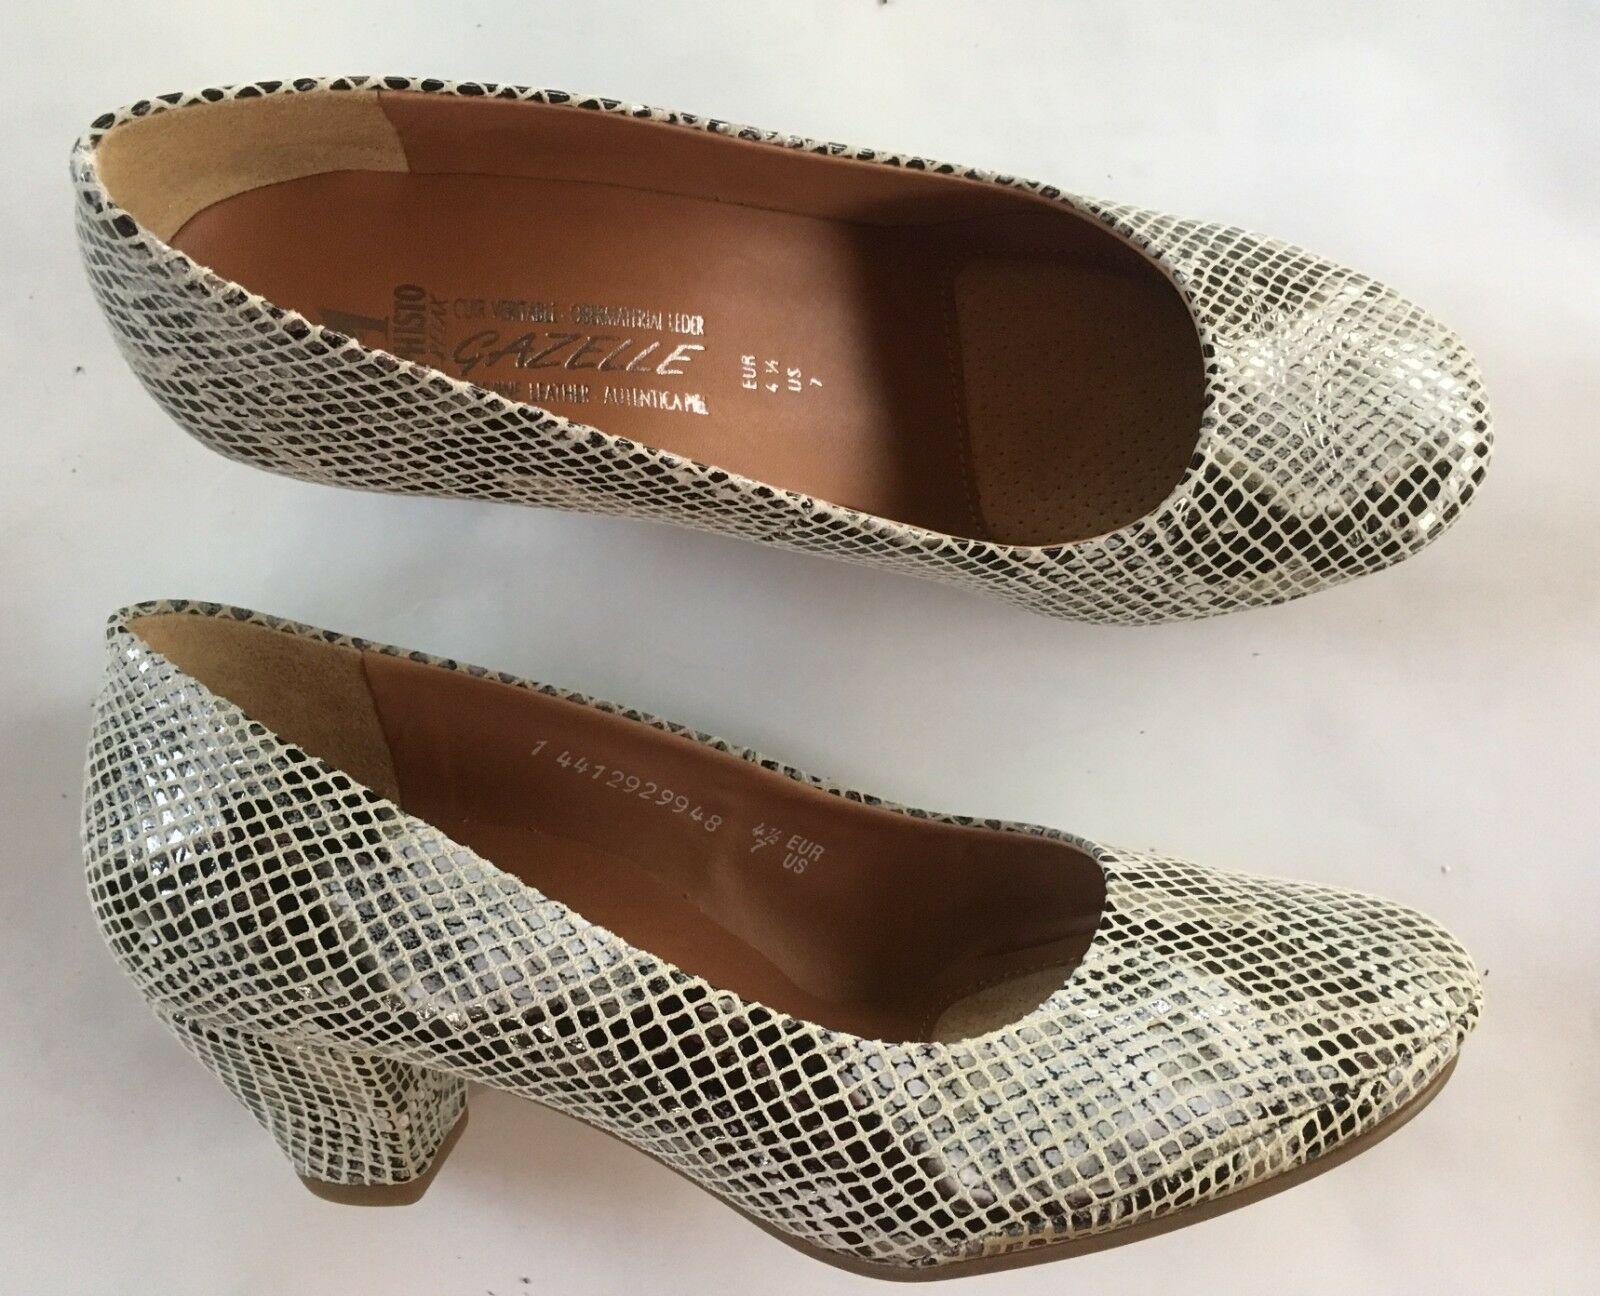 Chaussures escarpins Méphisto neuves beige 37,5